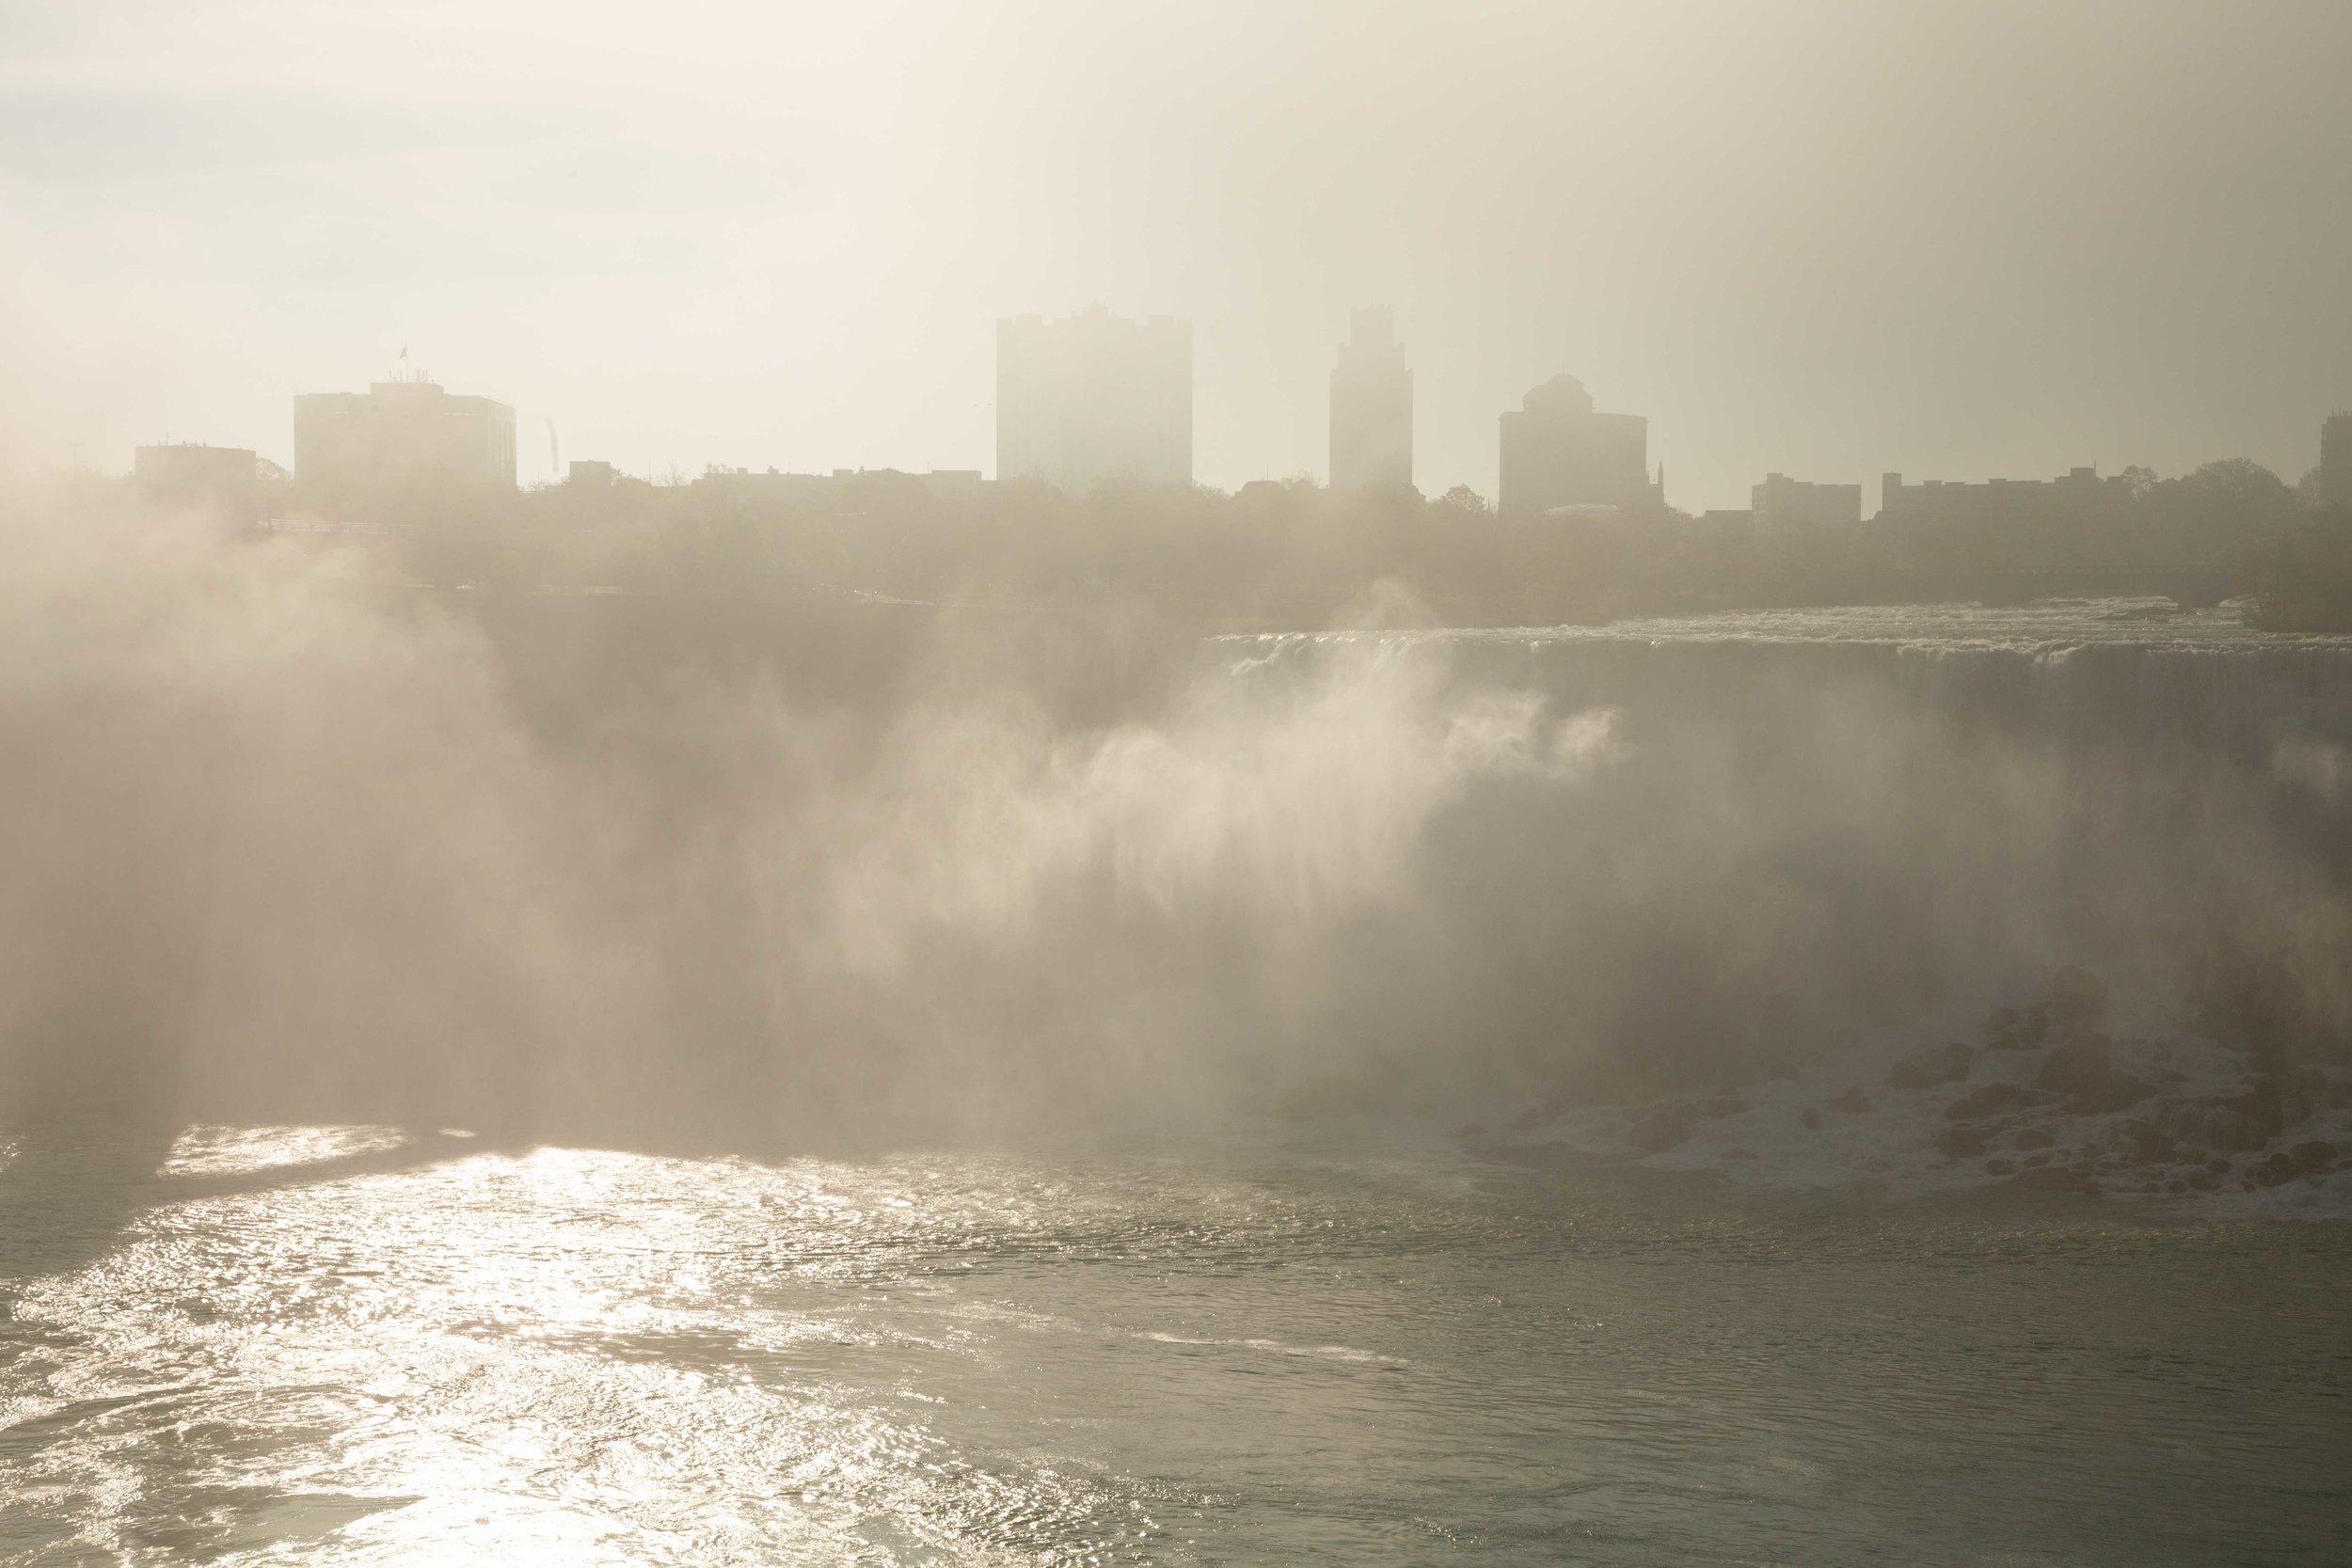 American Falls from Niagara Falls, Ontario